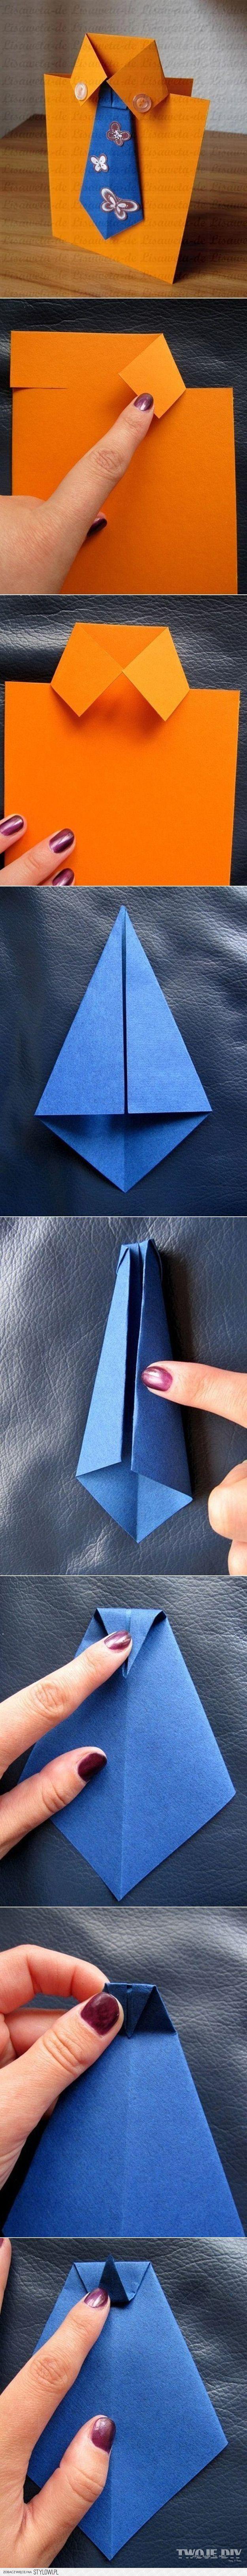 Cute DIY Father's Day Card Ideas | Necktie Card by DIY Ready at diyready.com/......